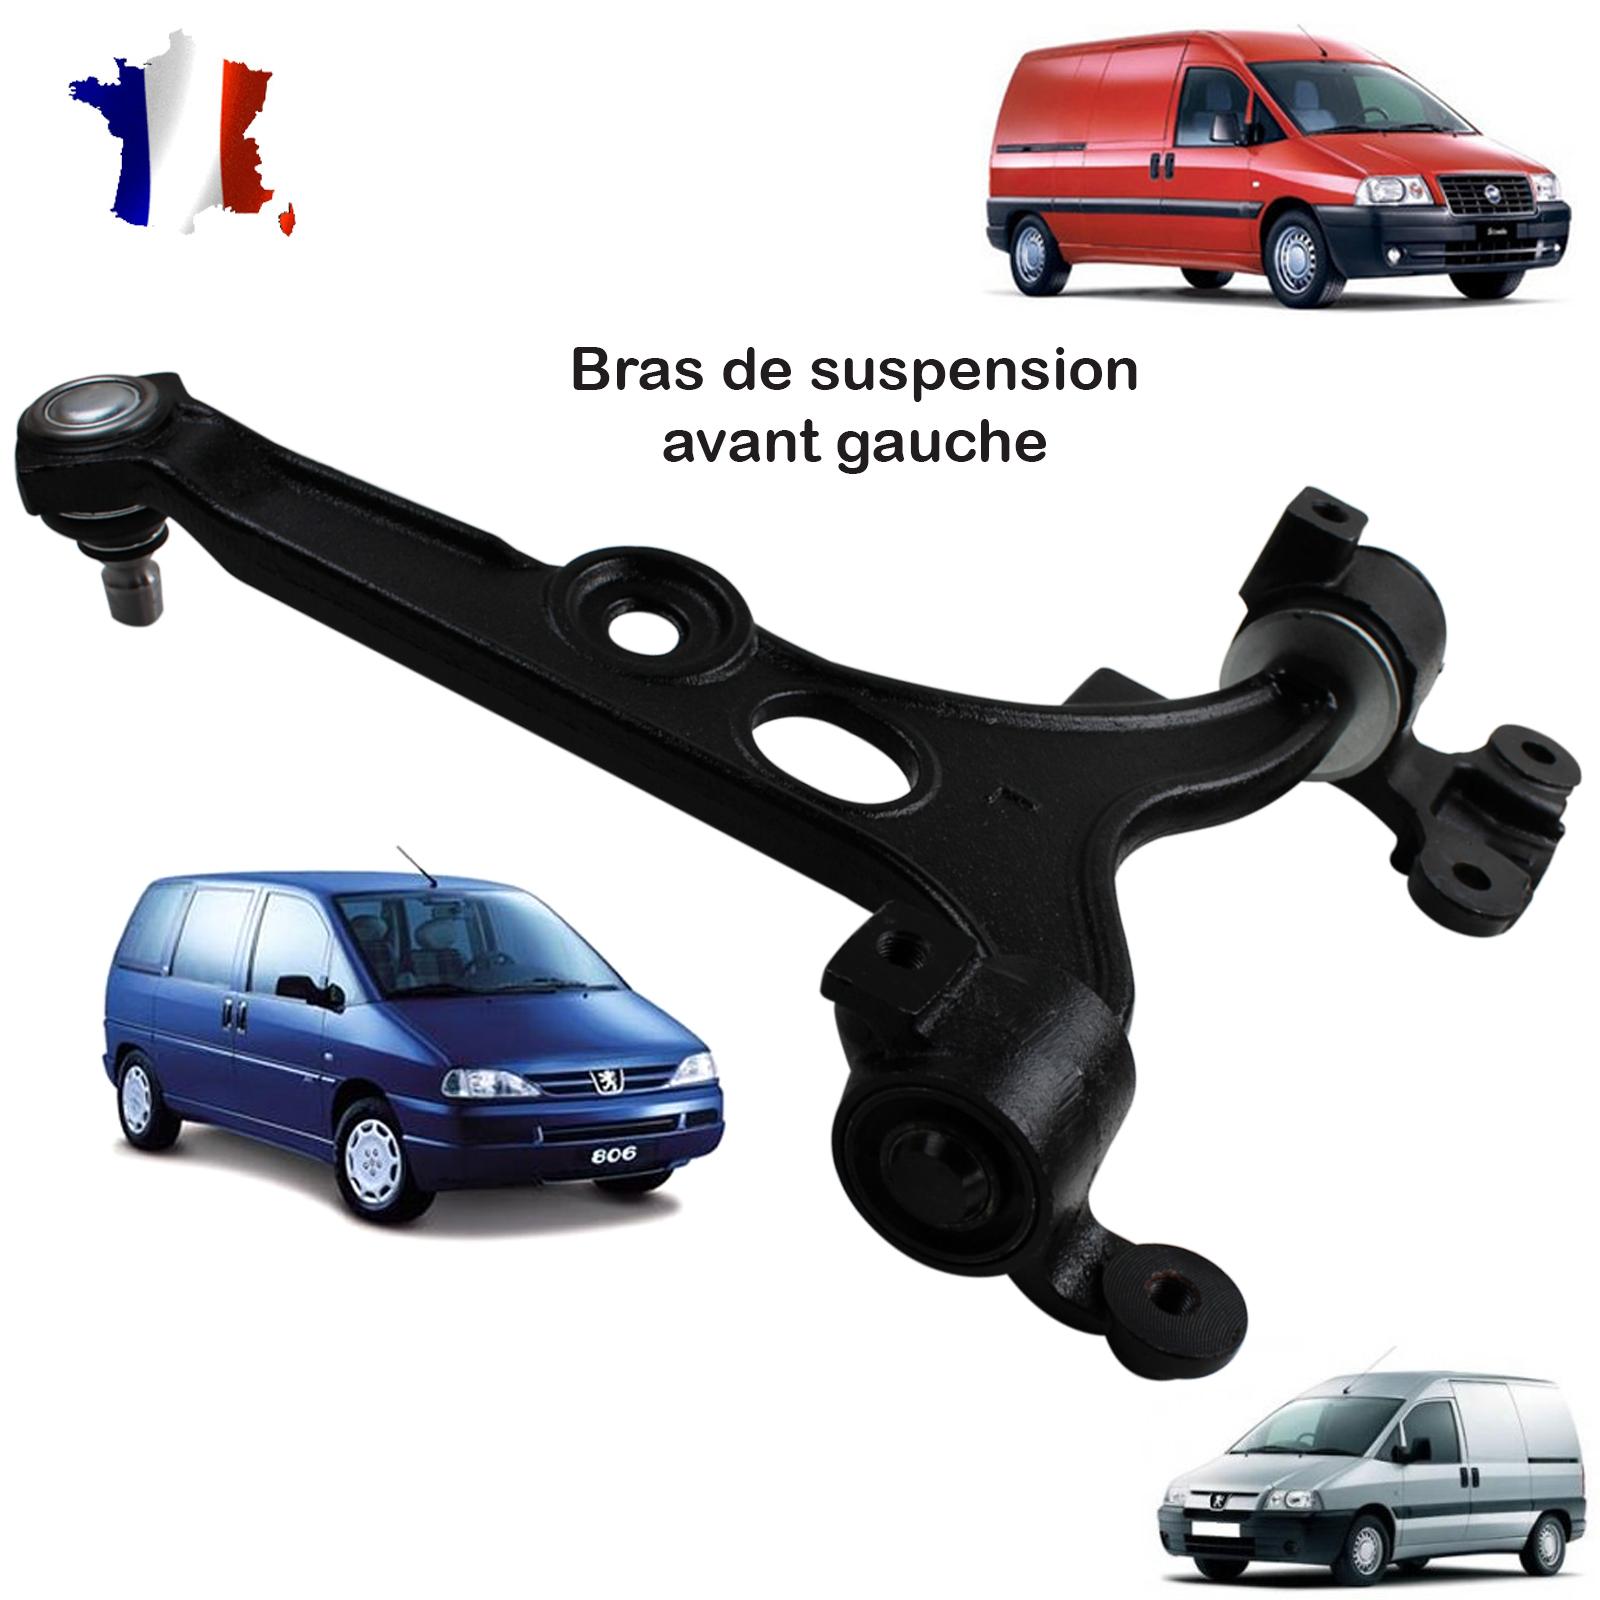 bras de suspension gauche Peugeot 806 Citroen Evasion